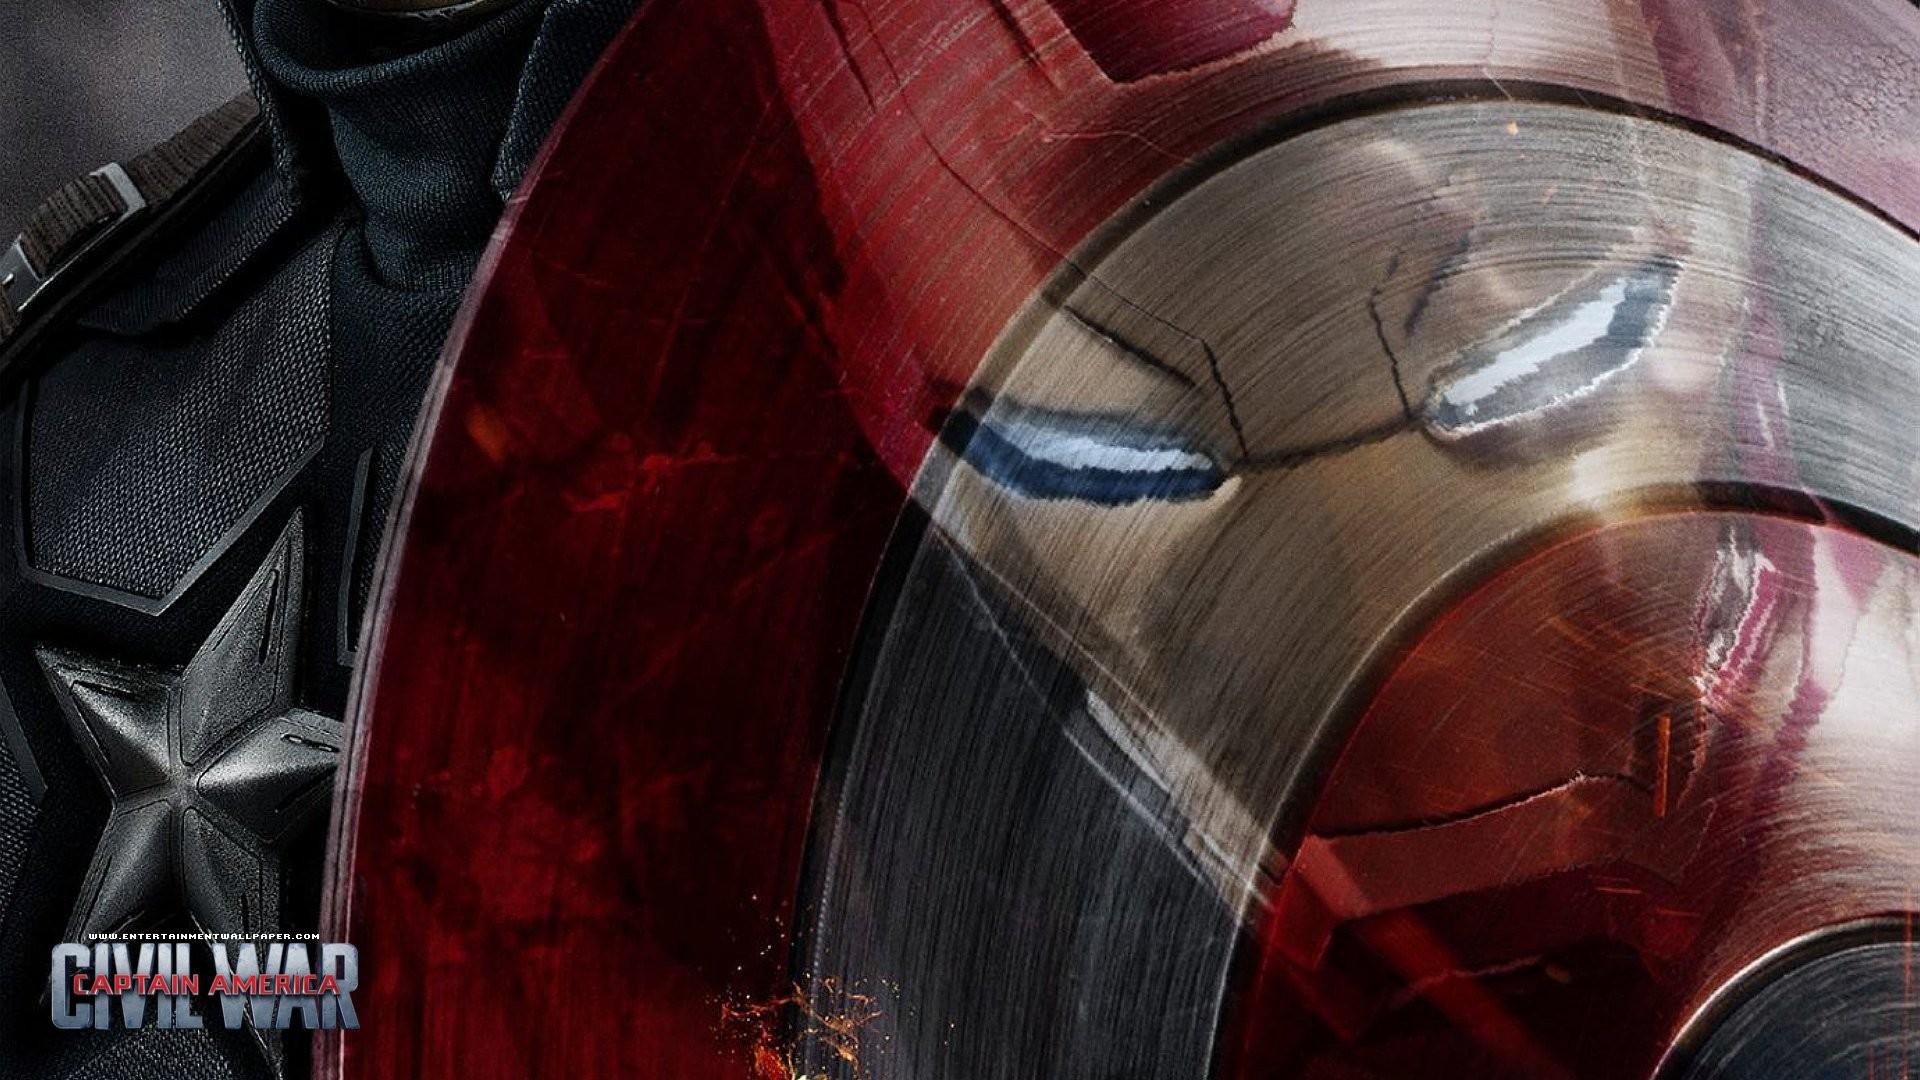 avengers civil war wallpaper 72 images